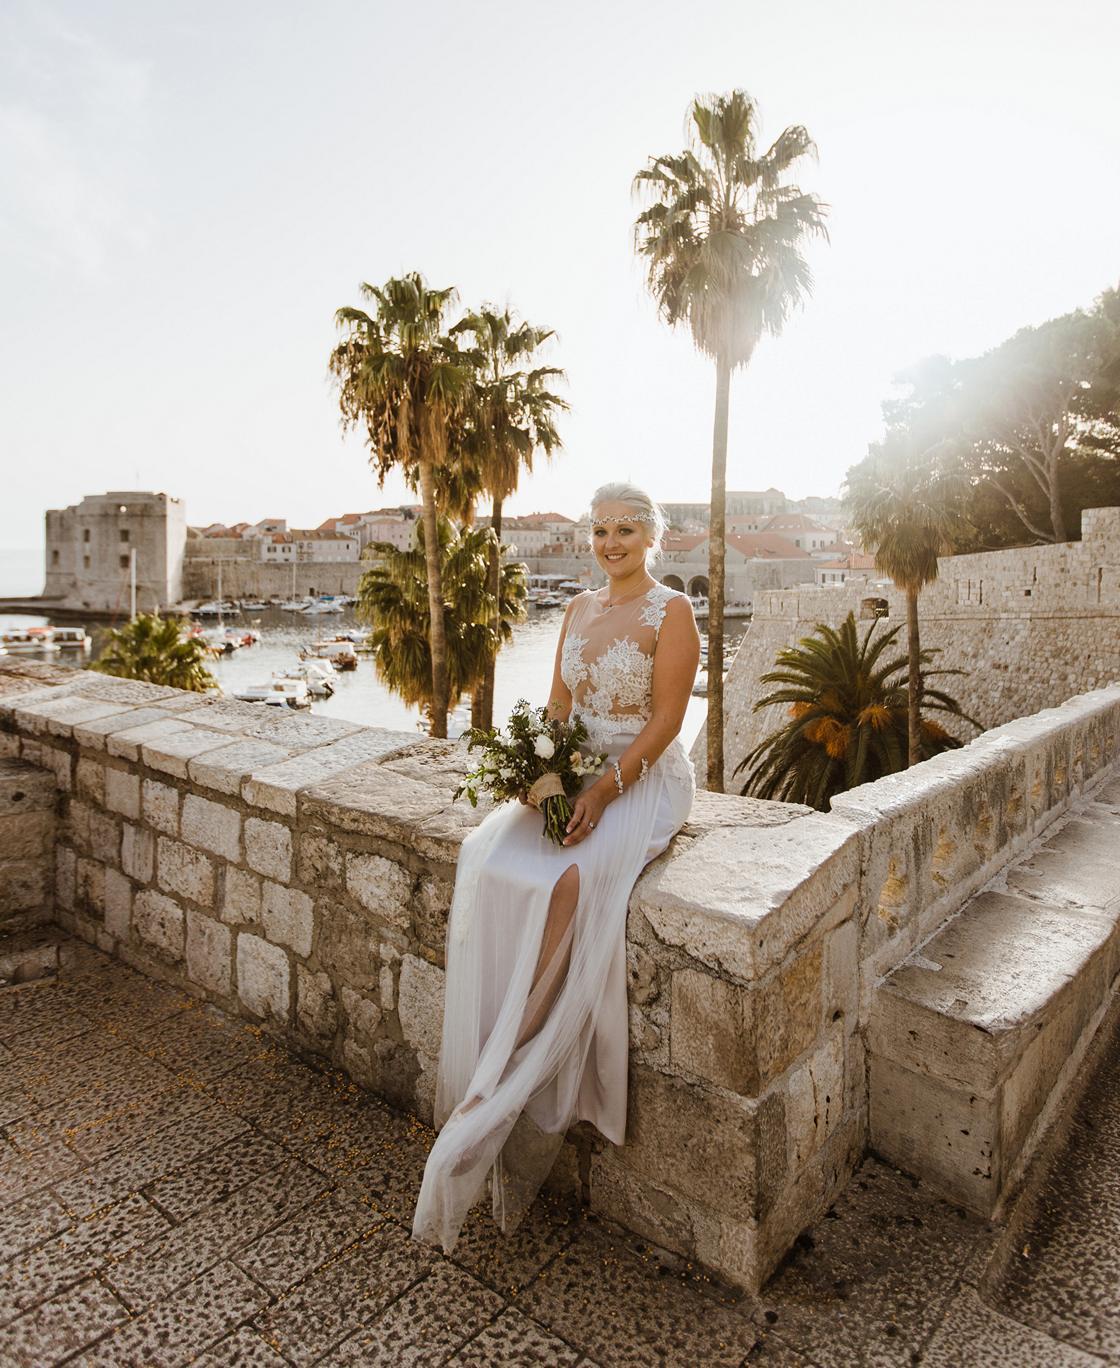 dubrovnik-wedding-photographer-croatia-destination-weddings-jenna-rich063